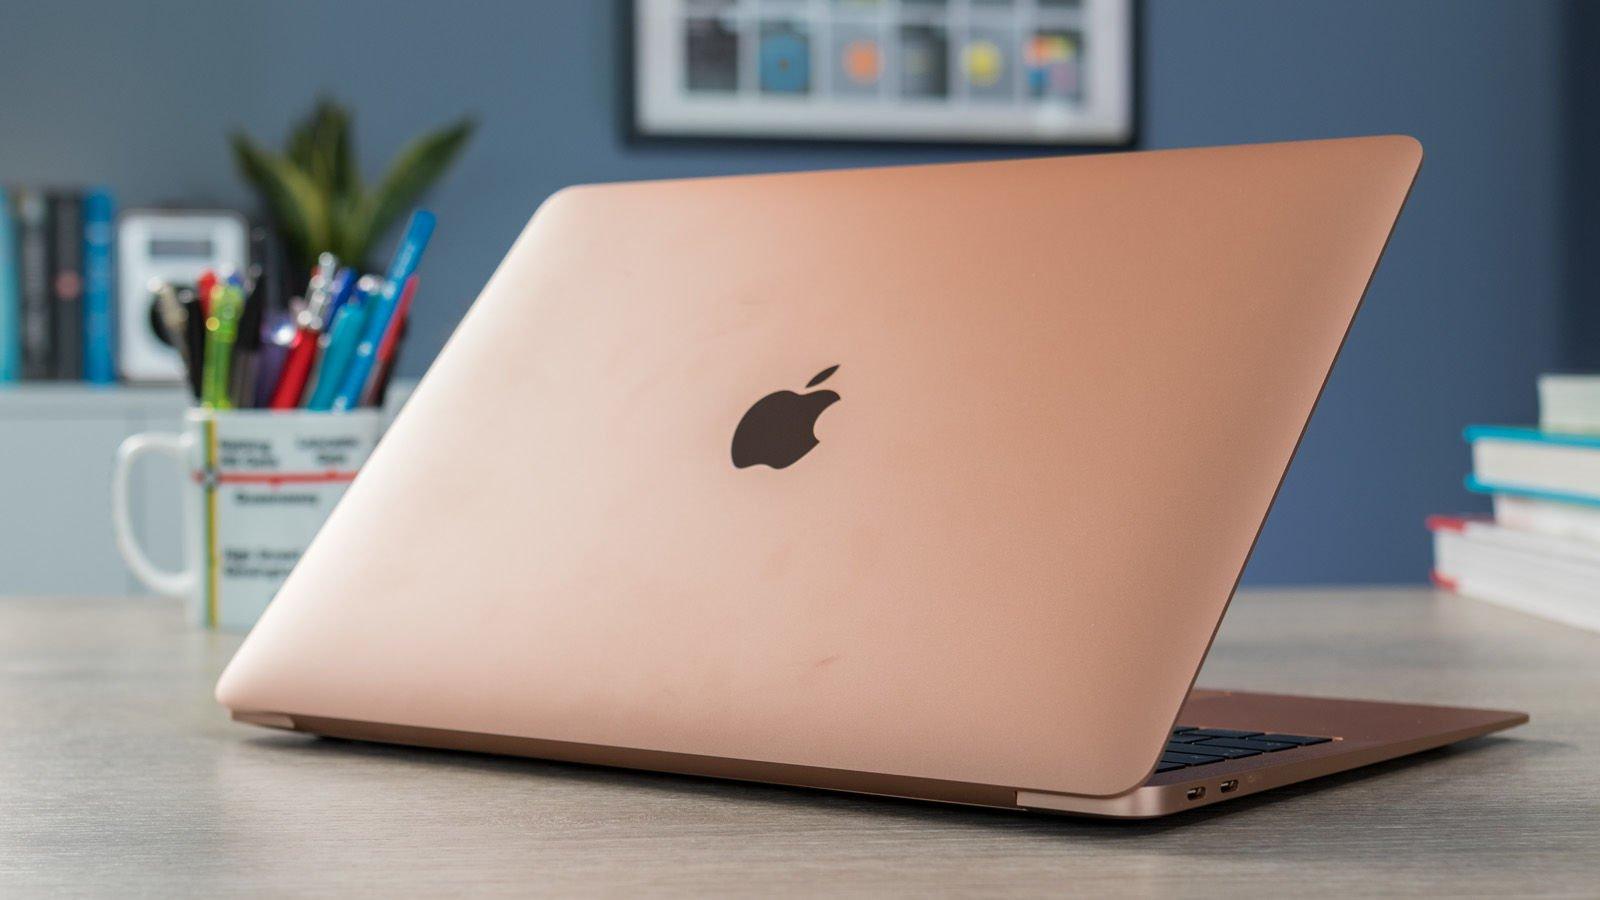 MacBook Air 2019 design